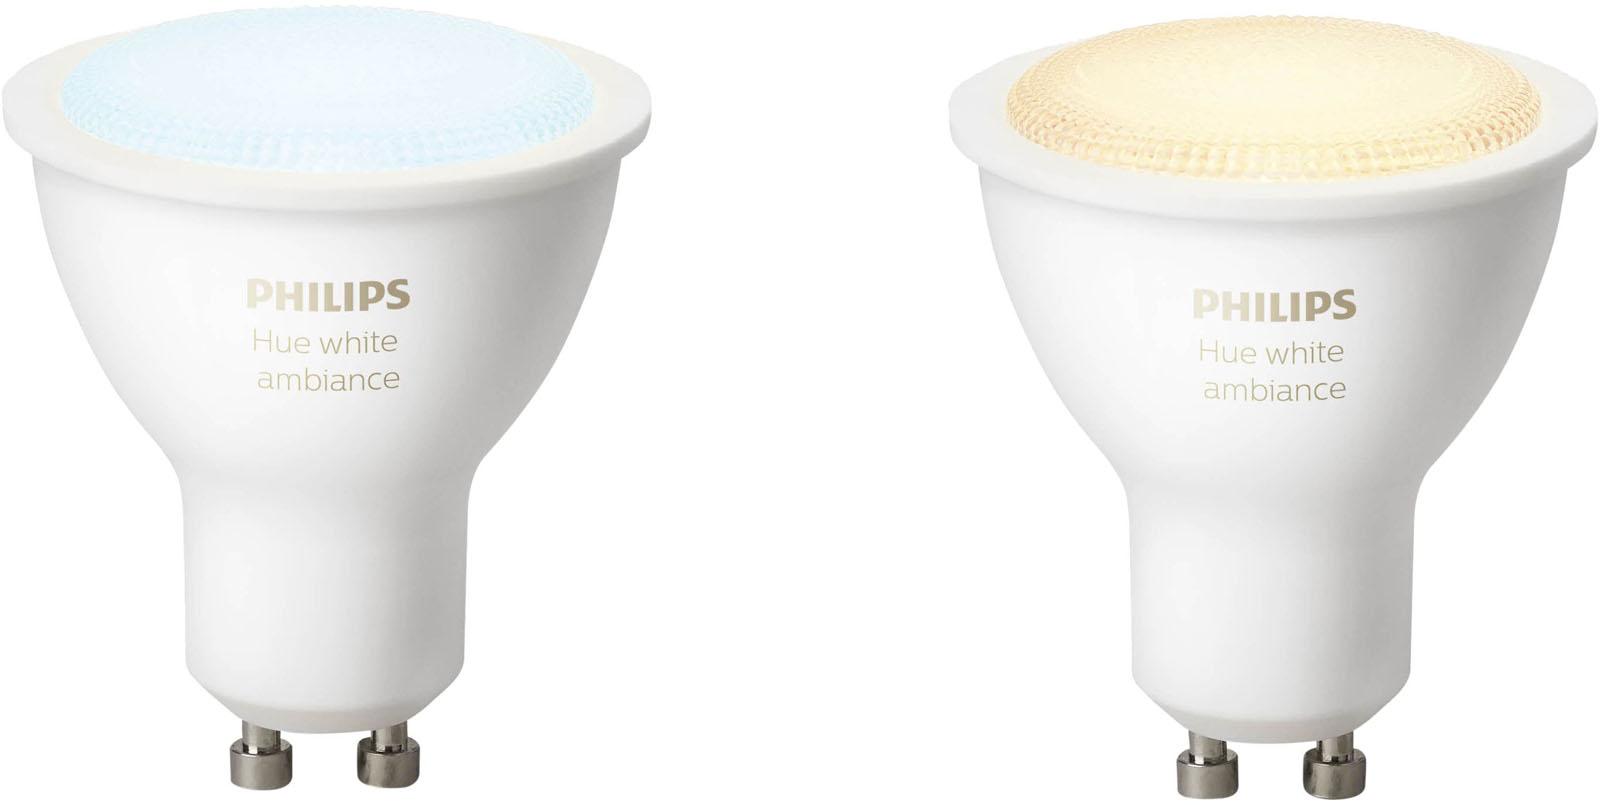 Philips Hue White Ambiance GU10 Bluetooth Duopak